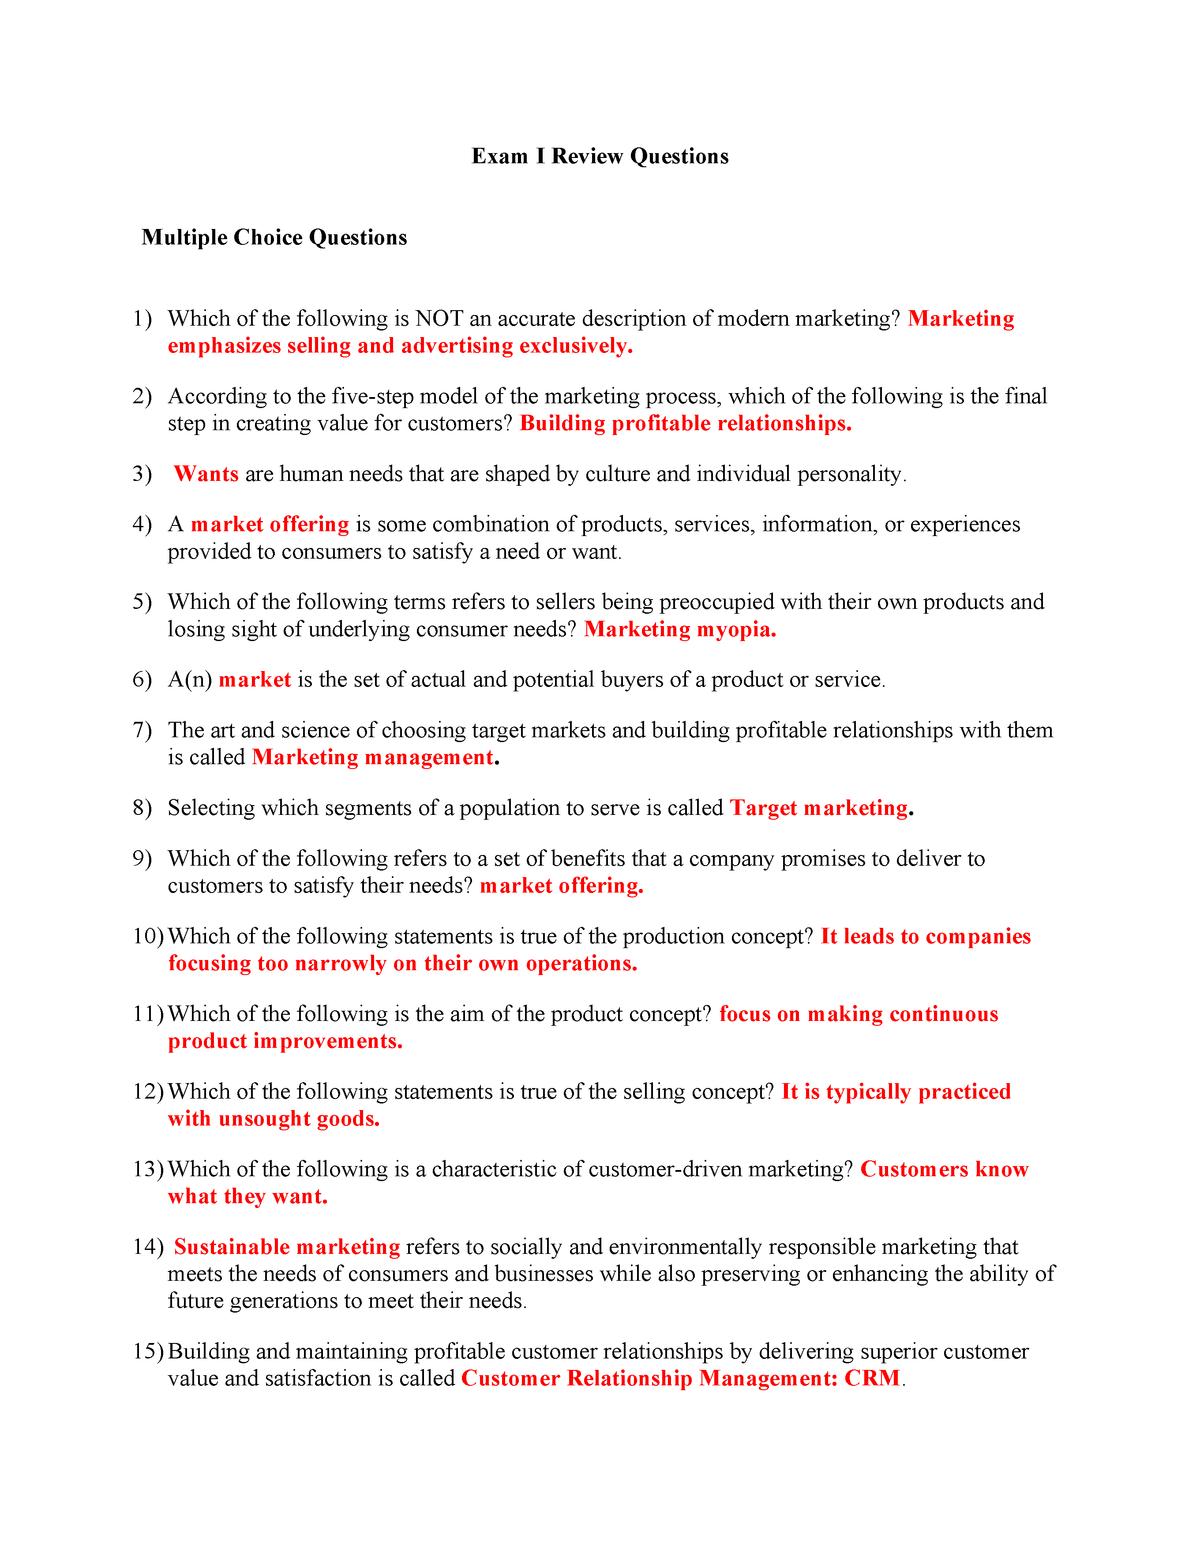 Exam 2018 - MBA 208: Marketing - StuDocu